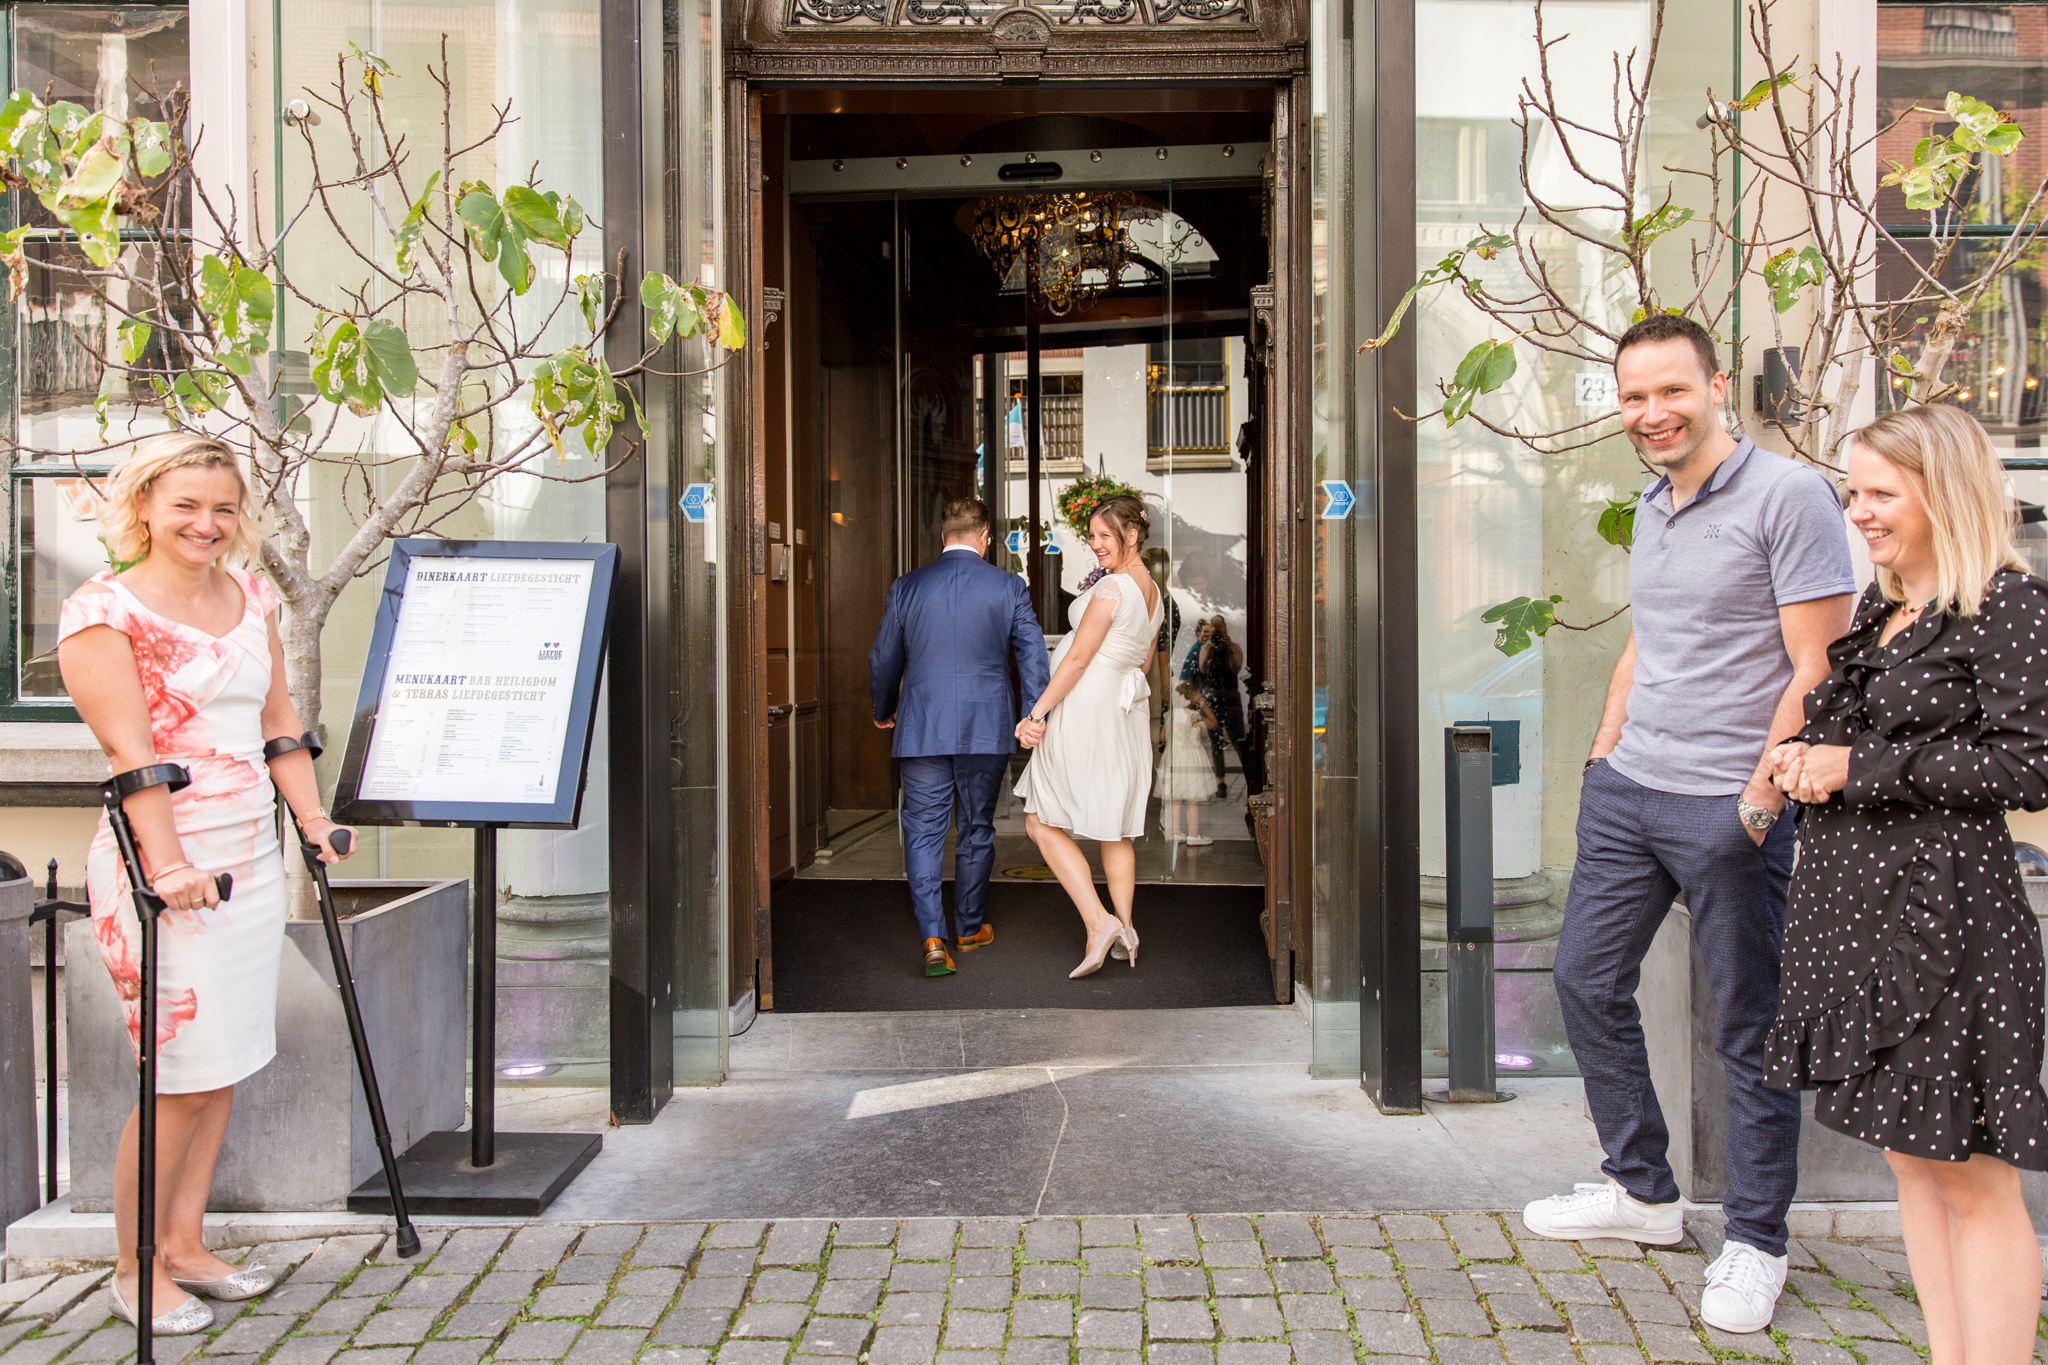 Trouwfotograaf Breda hotel nassau